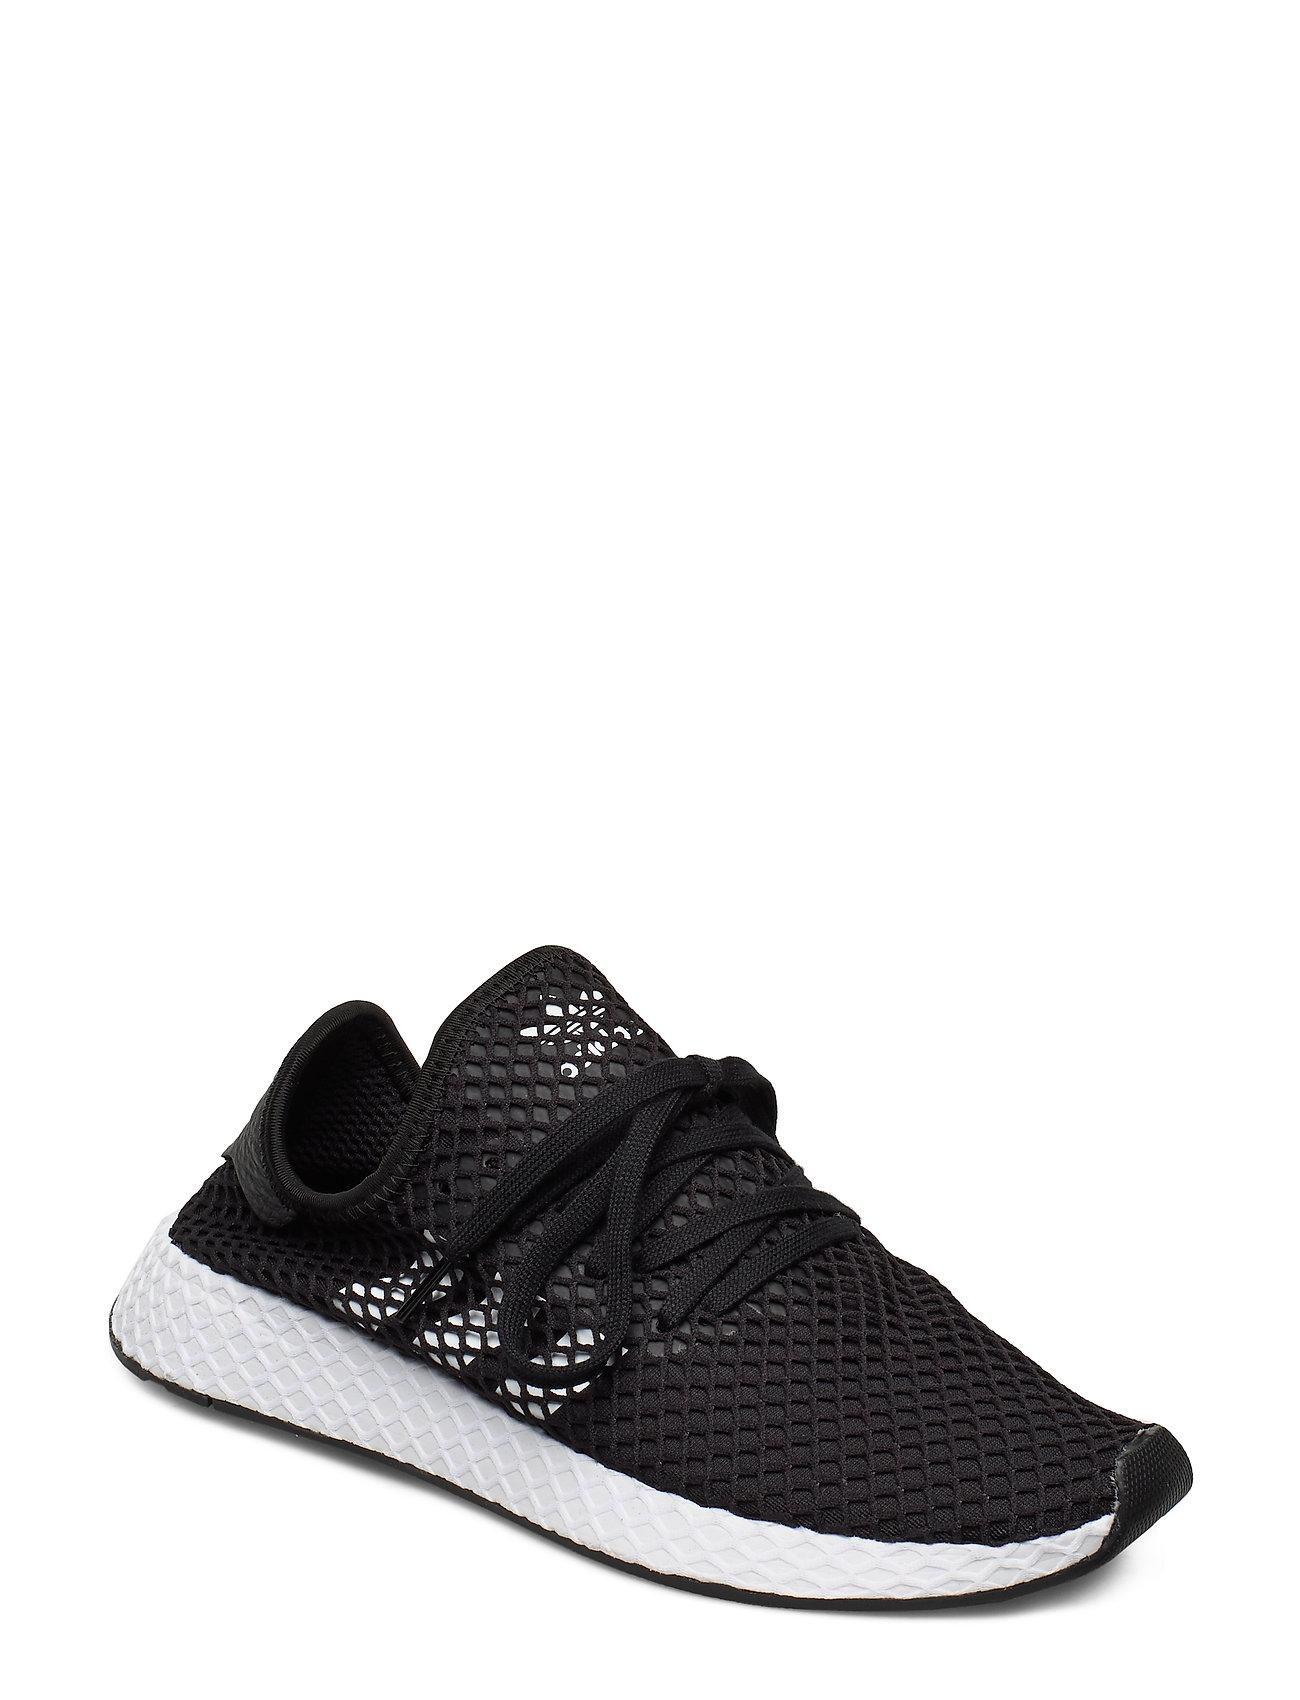 Delgado regla mostrador  adidas Originals Deerupt Runner (Cblack/ftwwht/cblack), (49.98 €) | Large  selection of outlet-styles | Booztlet.com